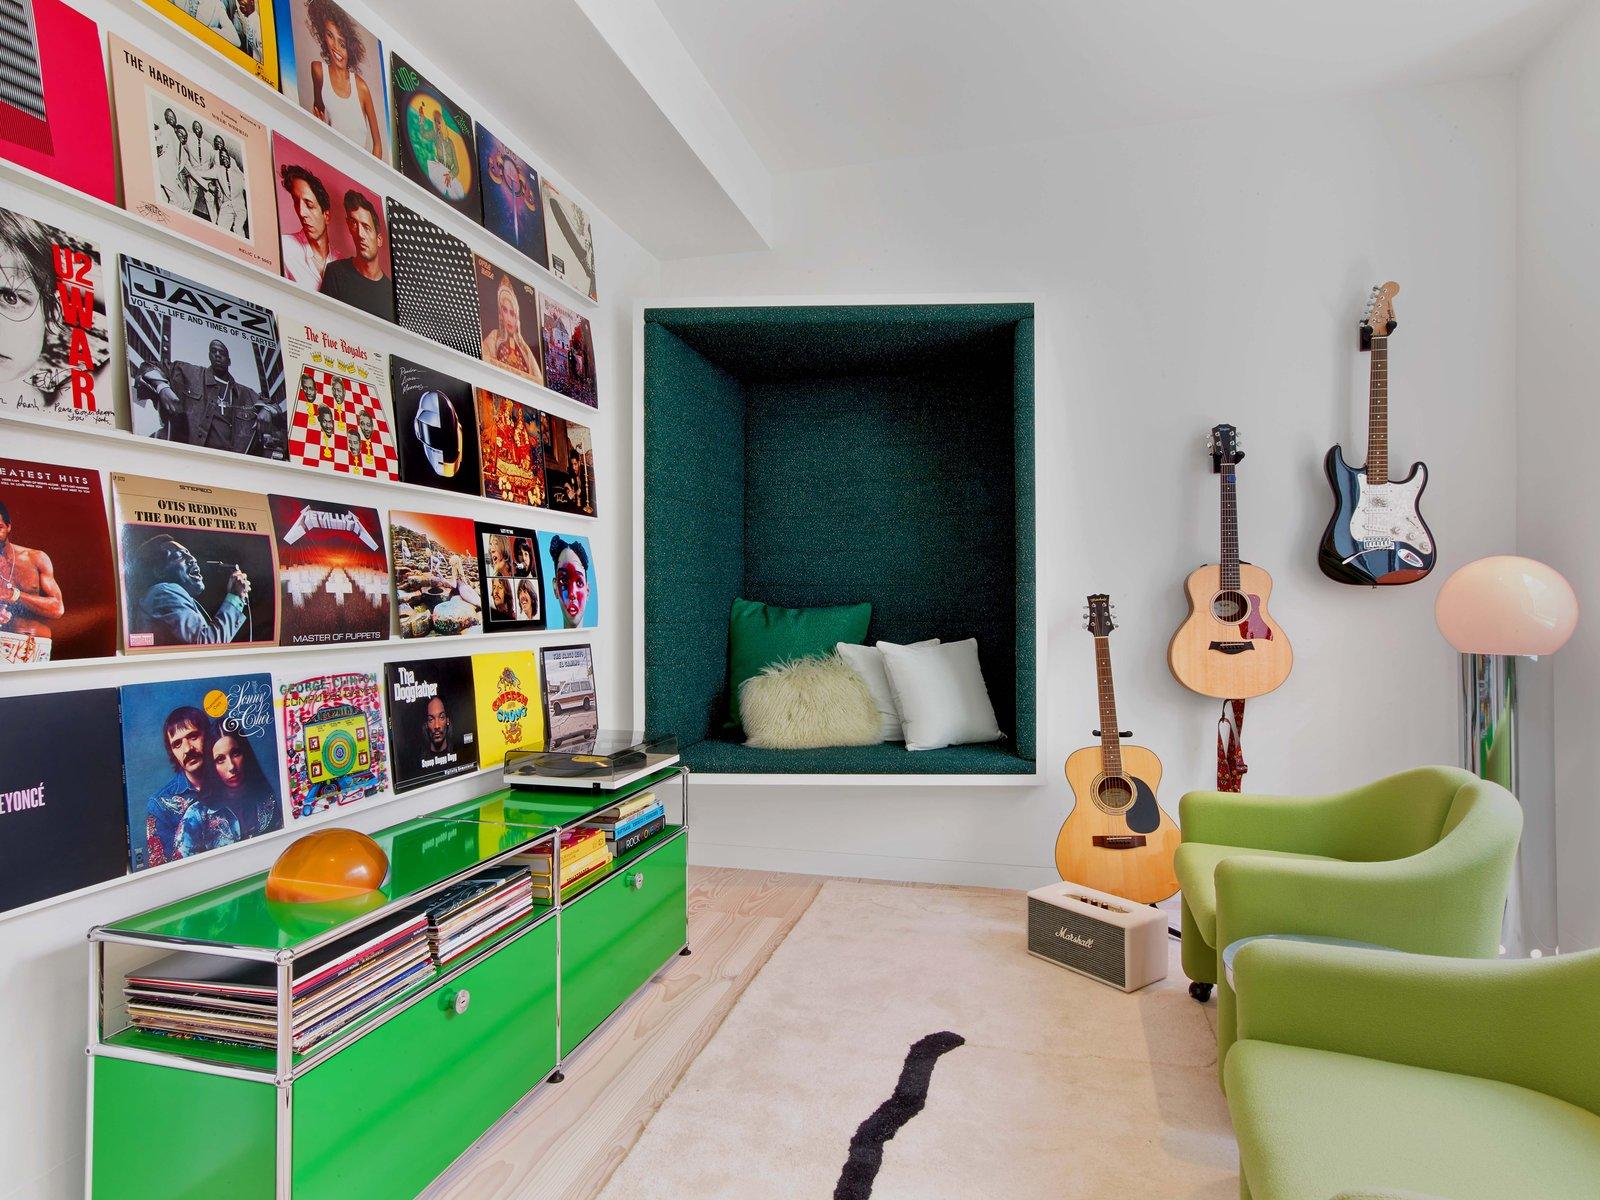 Office, Chair, Shelves, Storage, Carpet Floor, and Light Hardwood Floor  Glen Park Residence by CCS Architecture